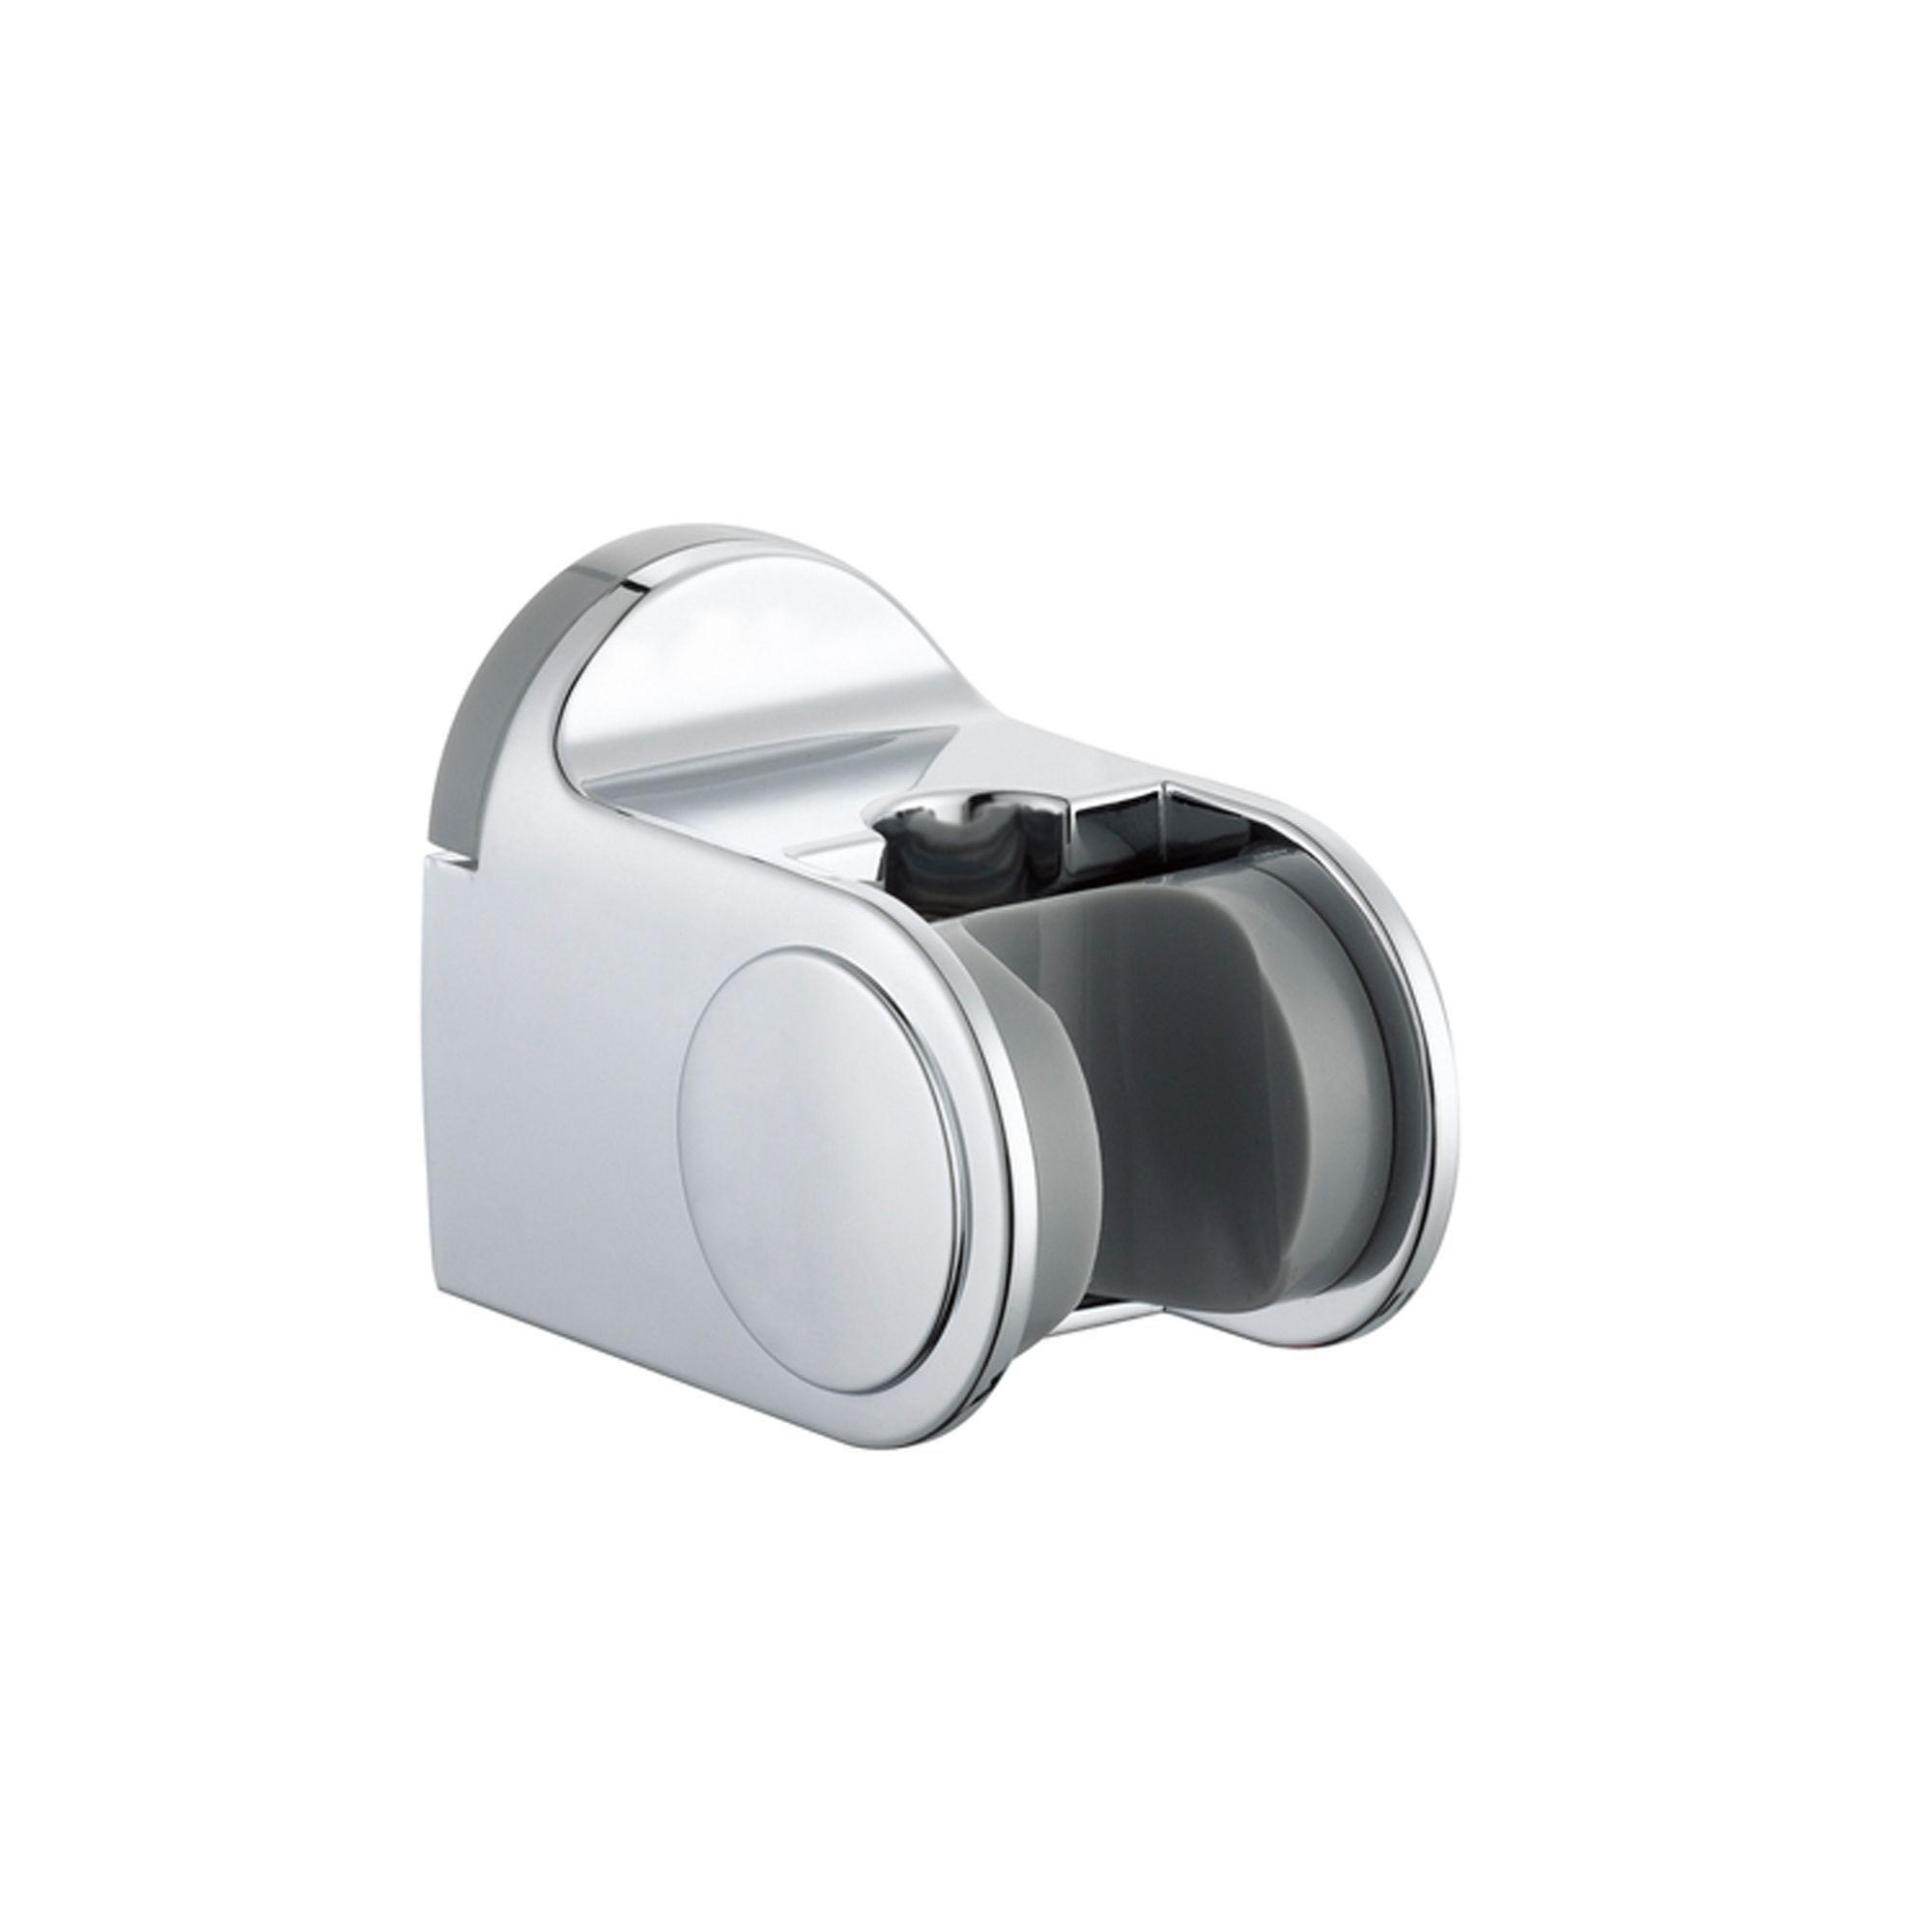 B Q Silver Chrome Effect Shower Head Holder Departments Diy At B Q